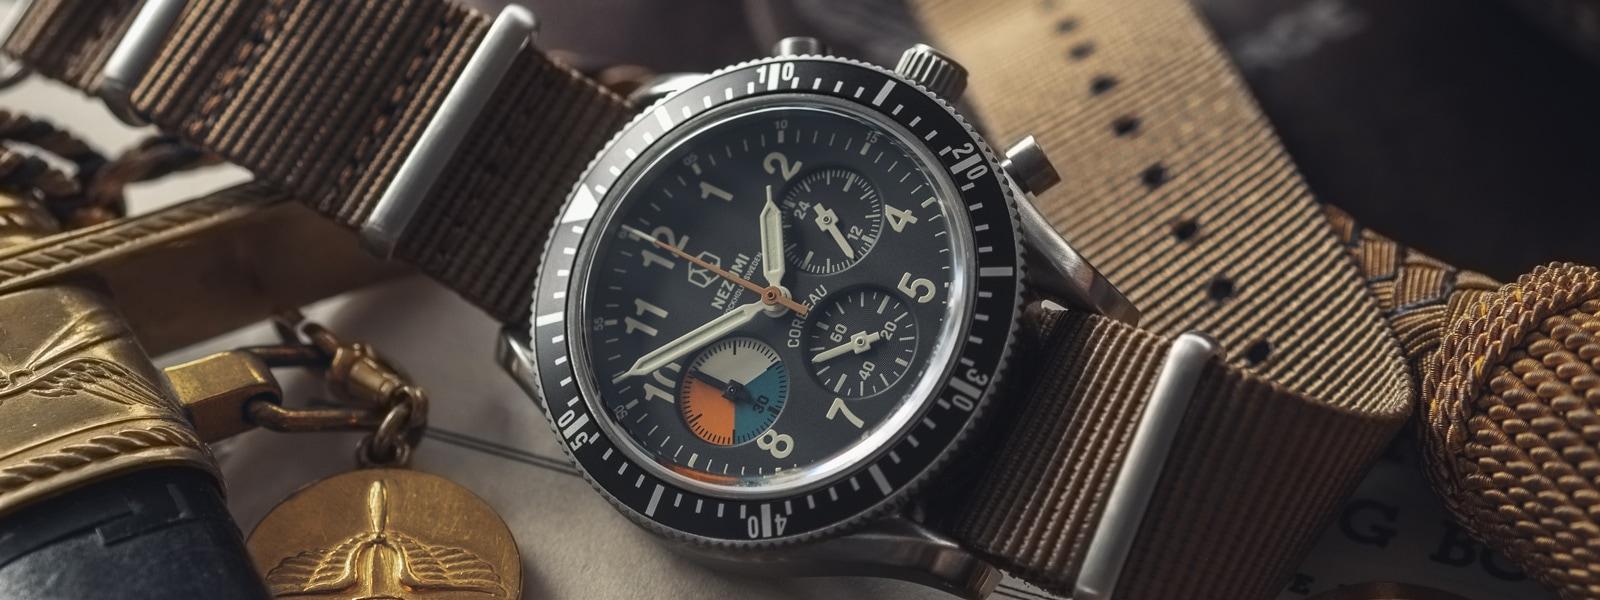 Nezumi Studios Watch Corbeau CQ2.533 military chronograph with nato strap